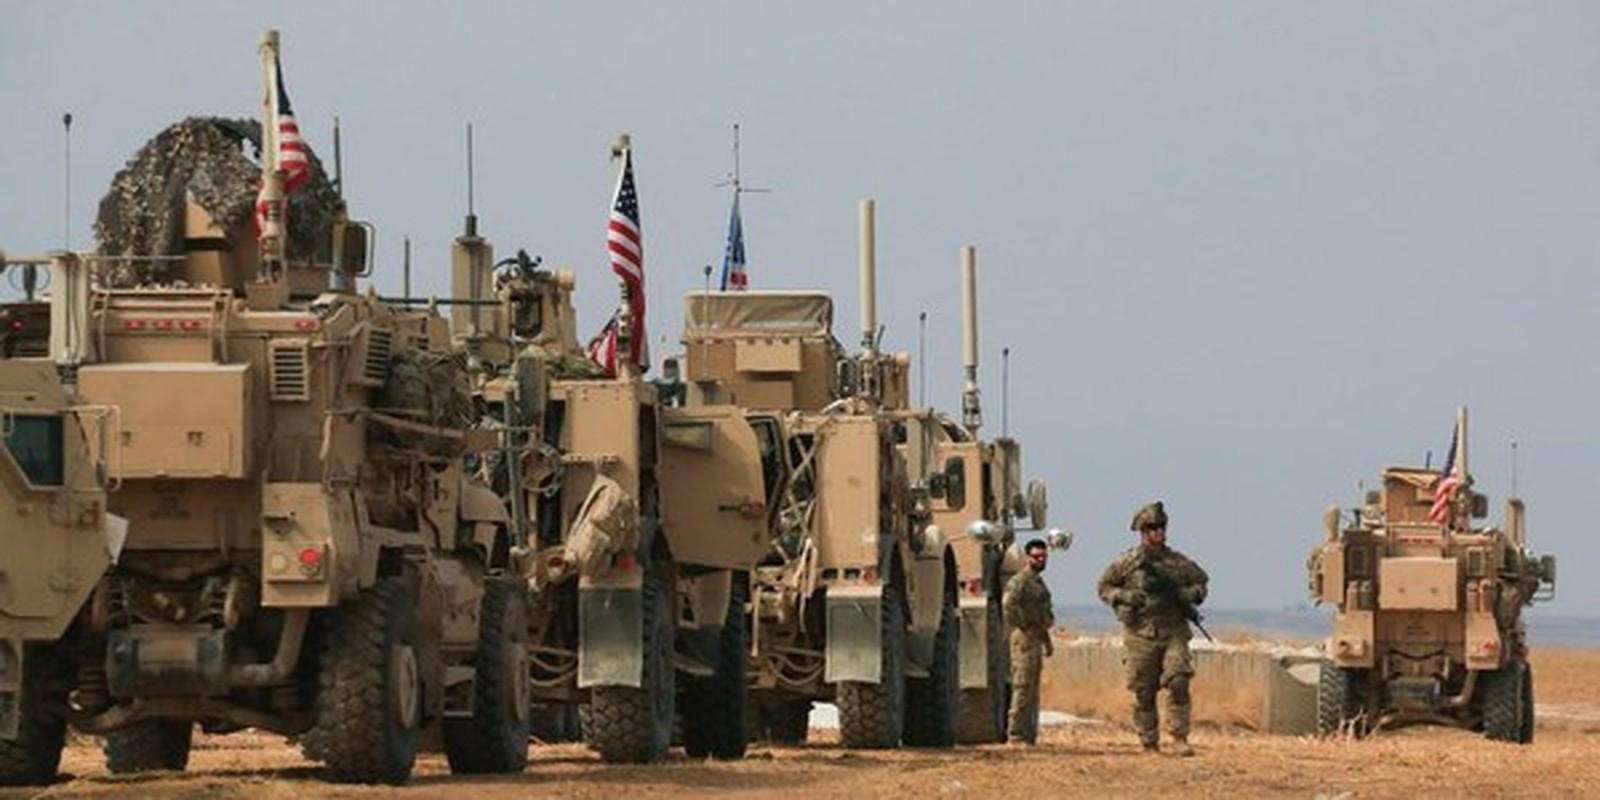 Xe boc thep My dam thang vao thiet giap BTR-80 Nga tai Syria-Hinh-4